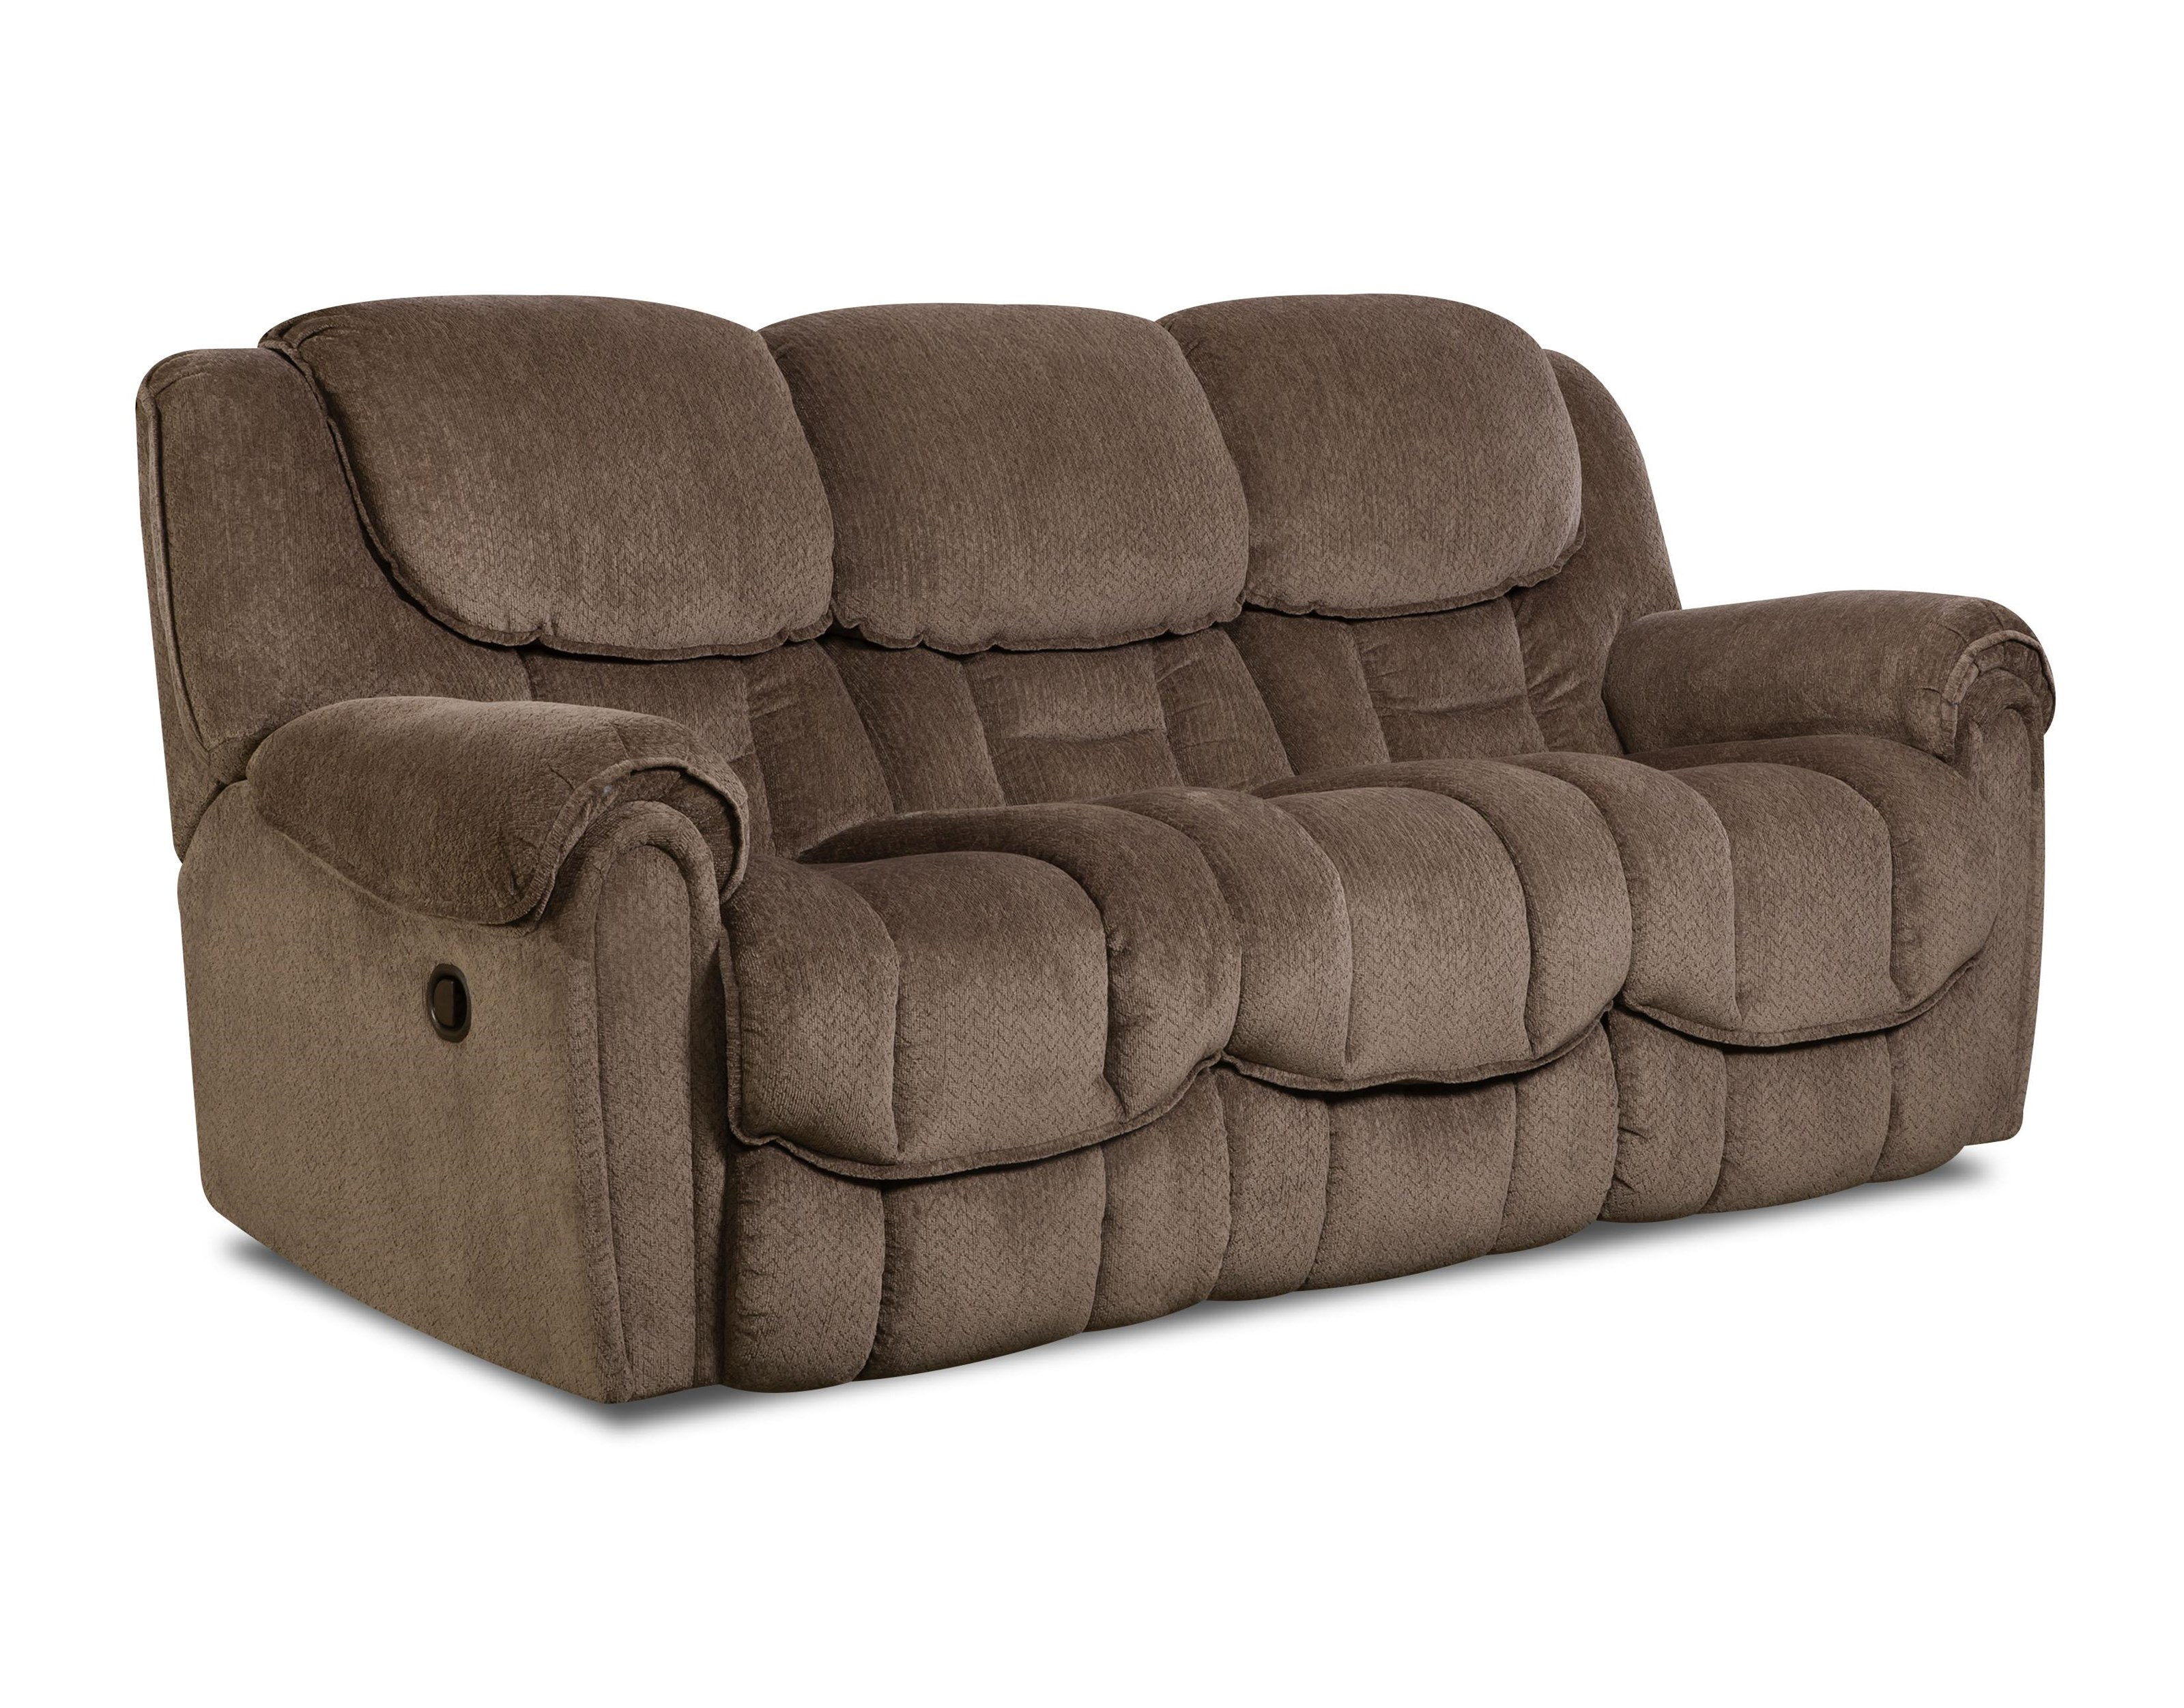 122 Casual Reclining Sofa by HomeStretch at Furniture Fair - North Carolina